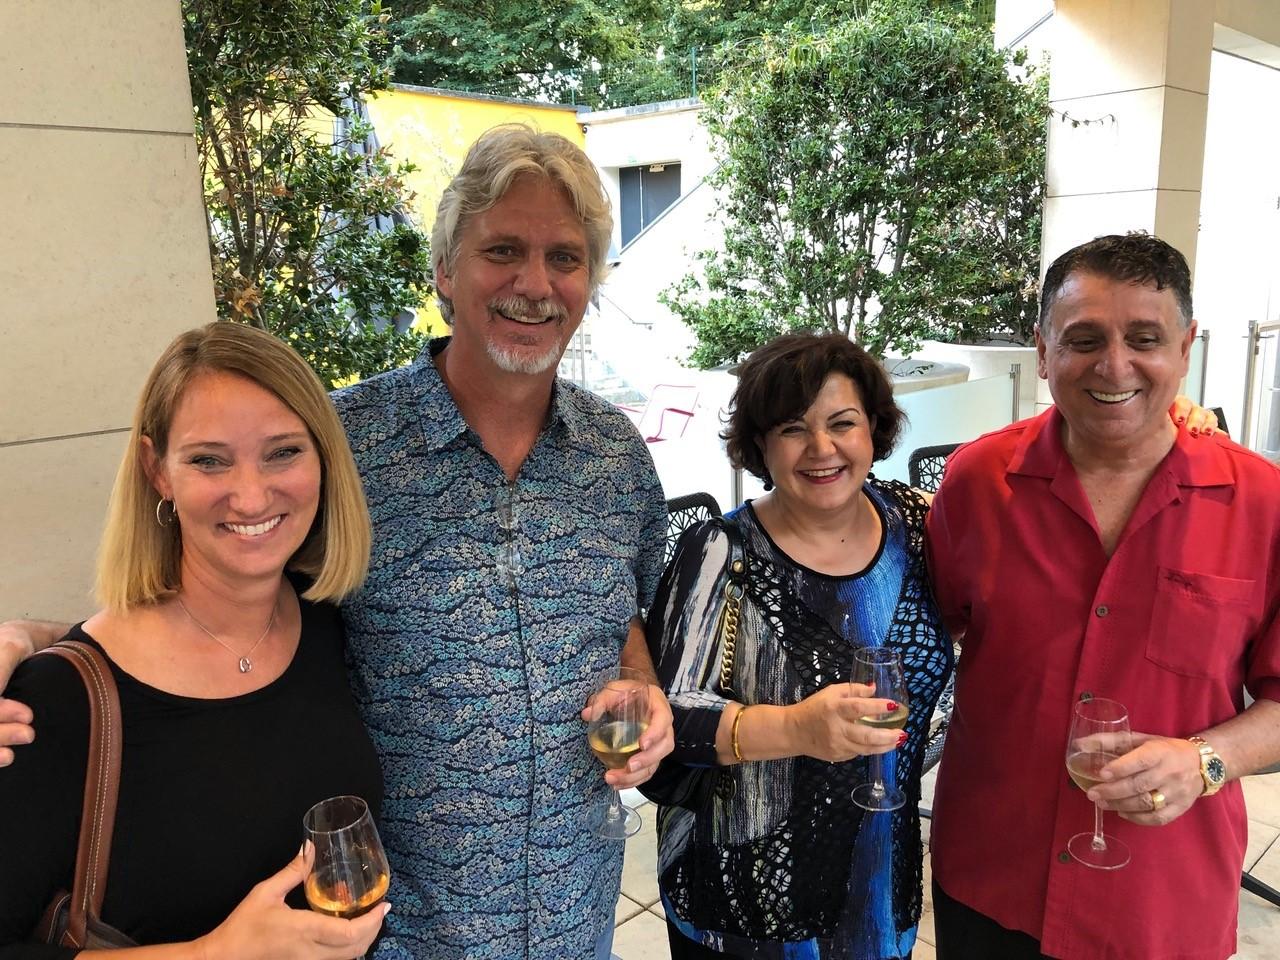 Guests posing at wine tasting